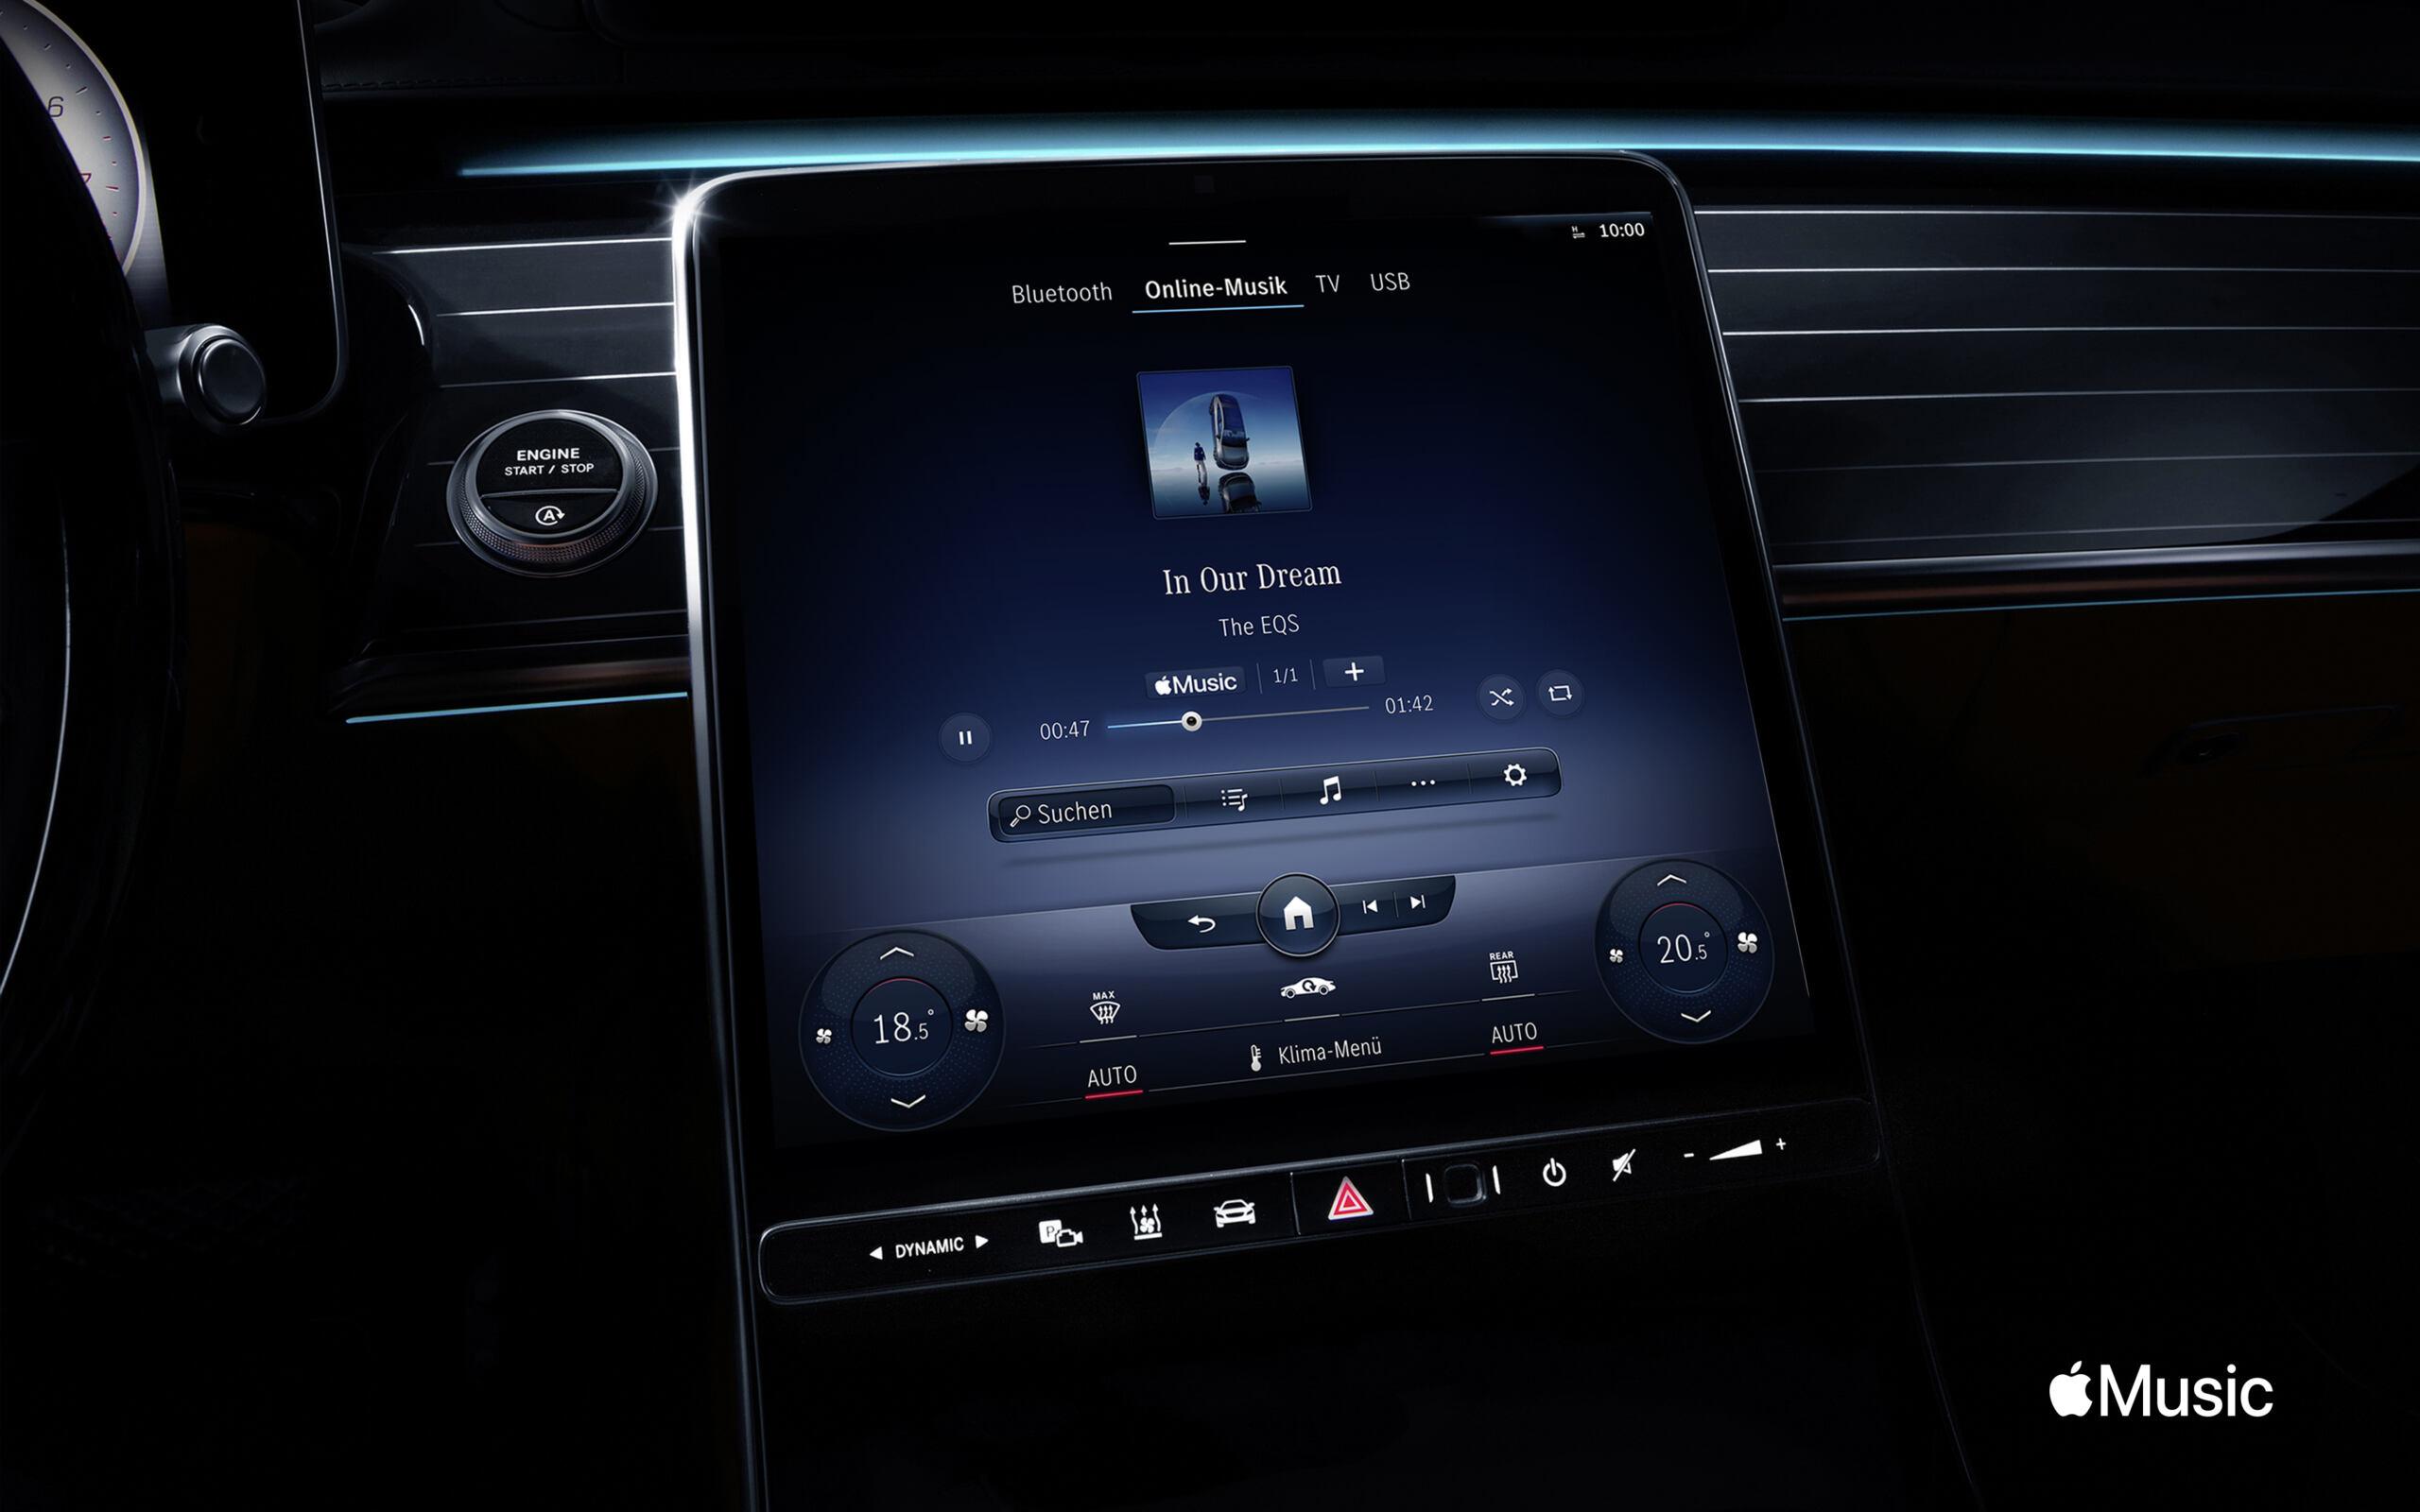 Mercedes Apple Music